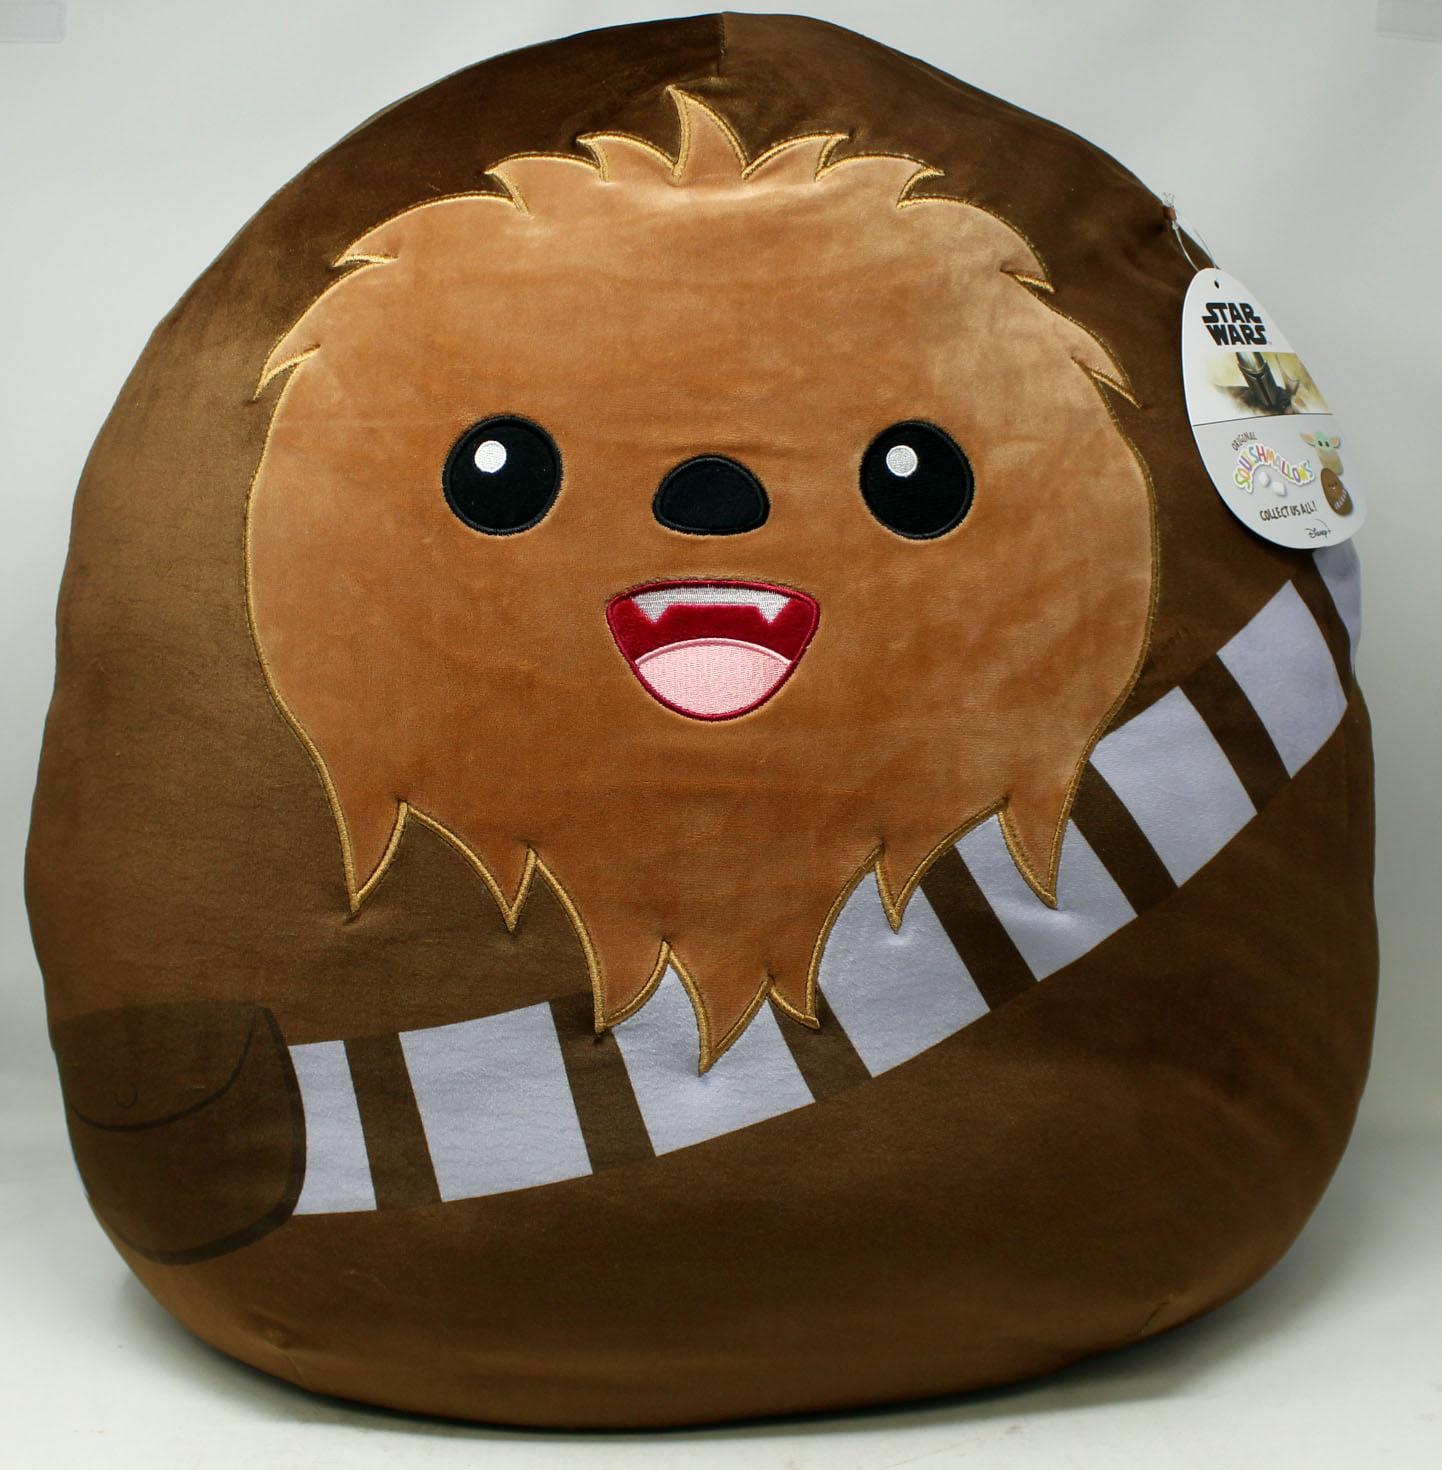 Star Wars Mandalorian Chewbacca  Plush Toy ~ Squishmallow 20 Inch